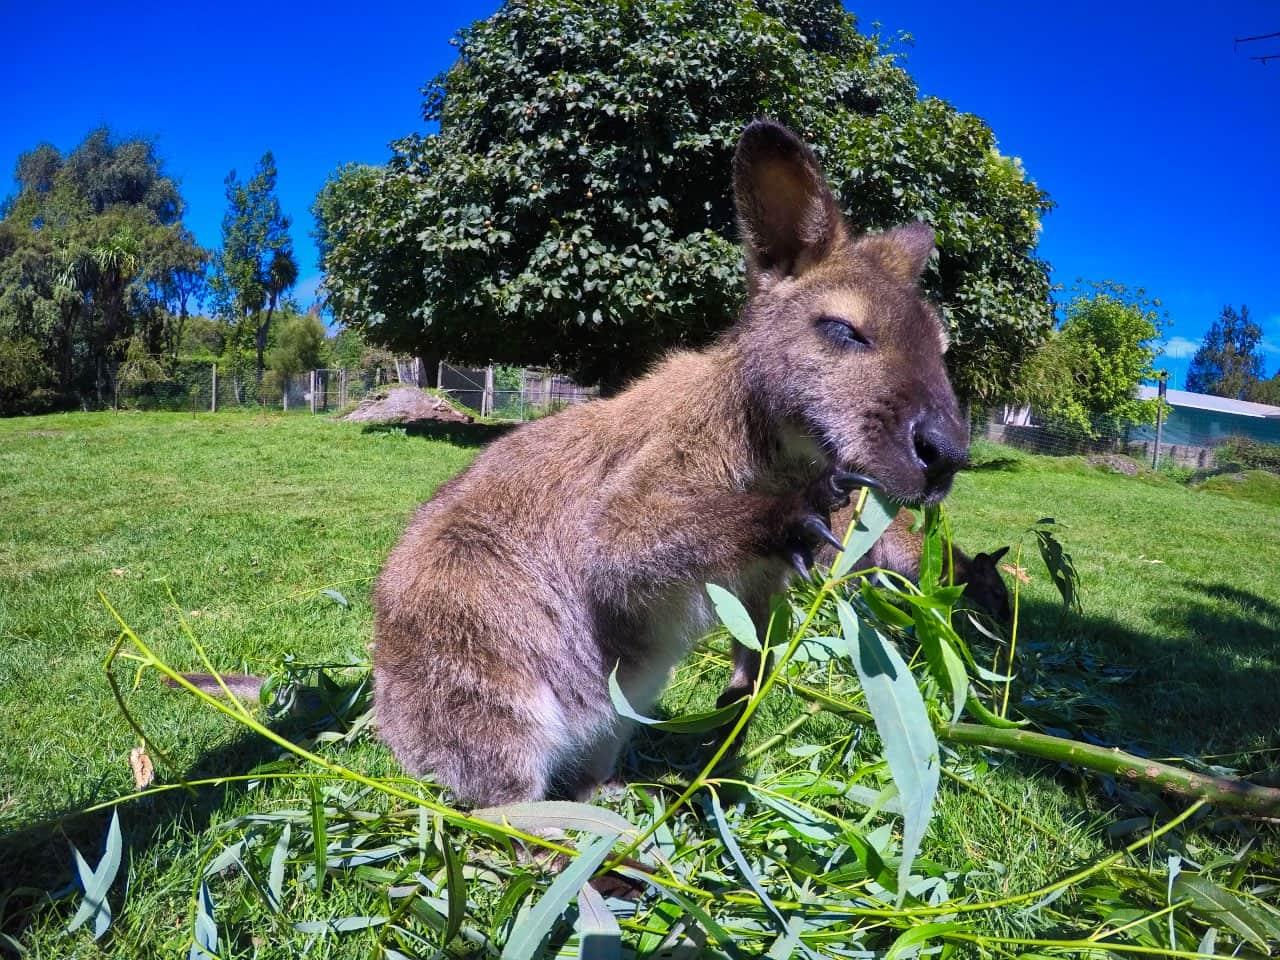 Willowbank-Wildlife-Park-Chistchurch-Wallaby-eating